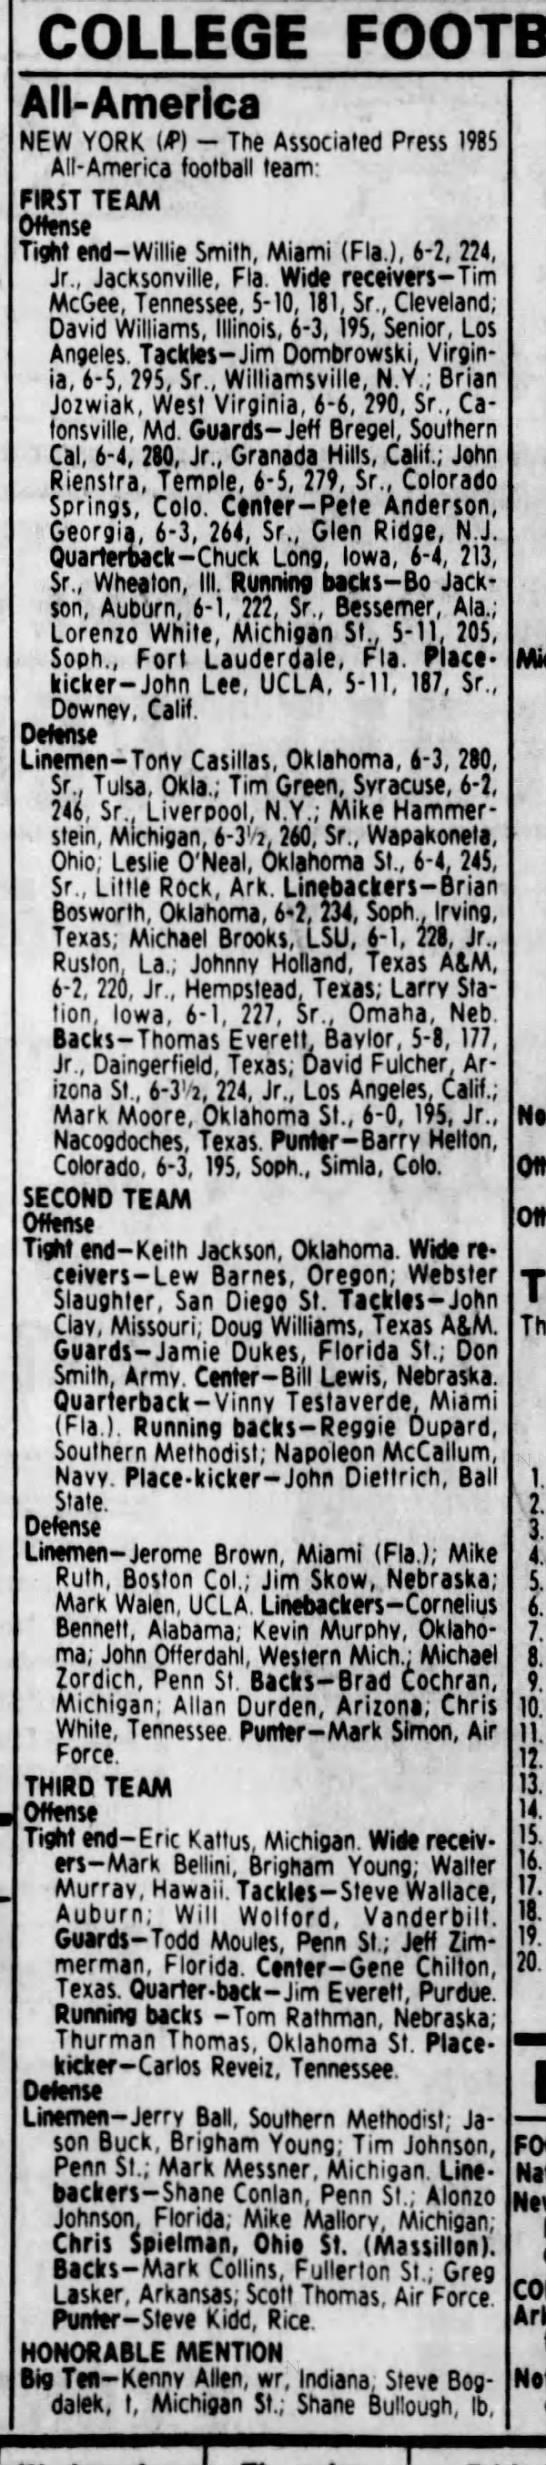 1985 Associated Press All-America football team -